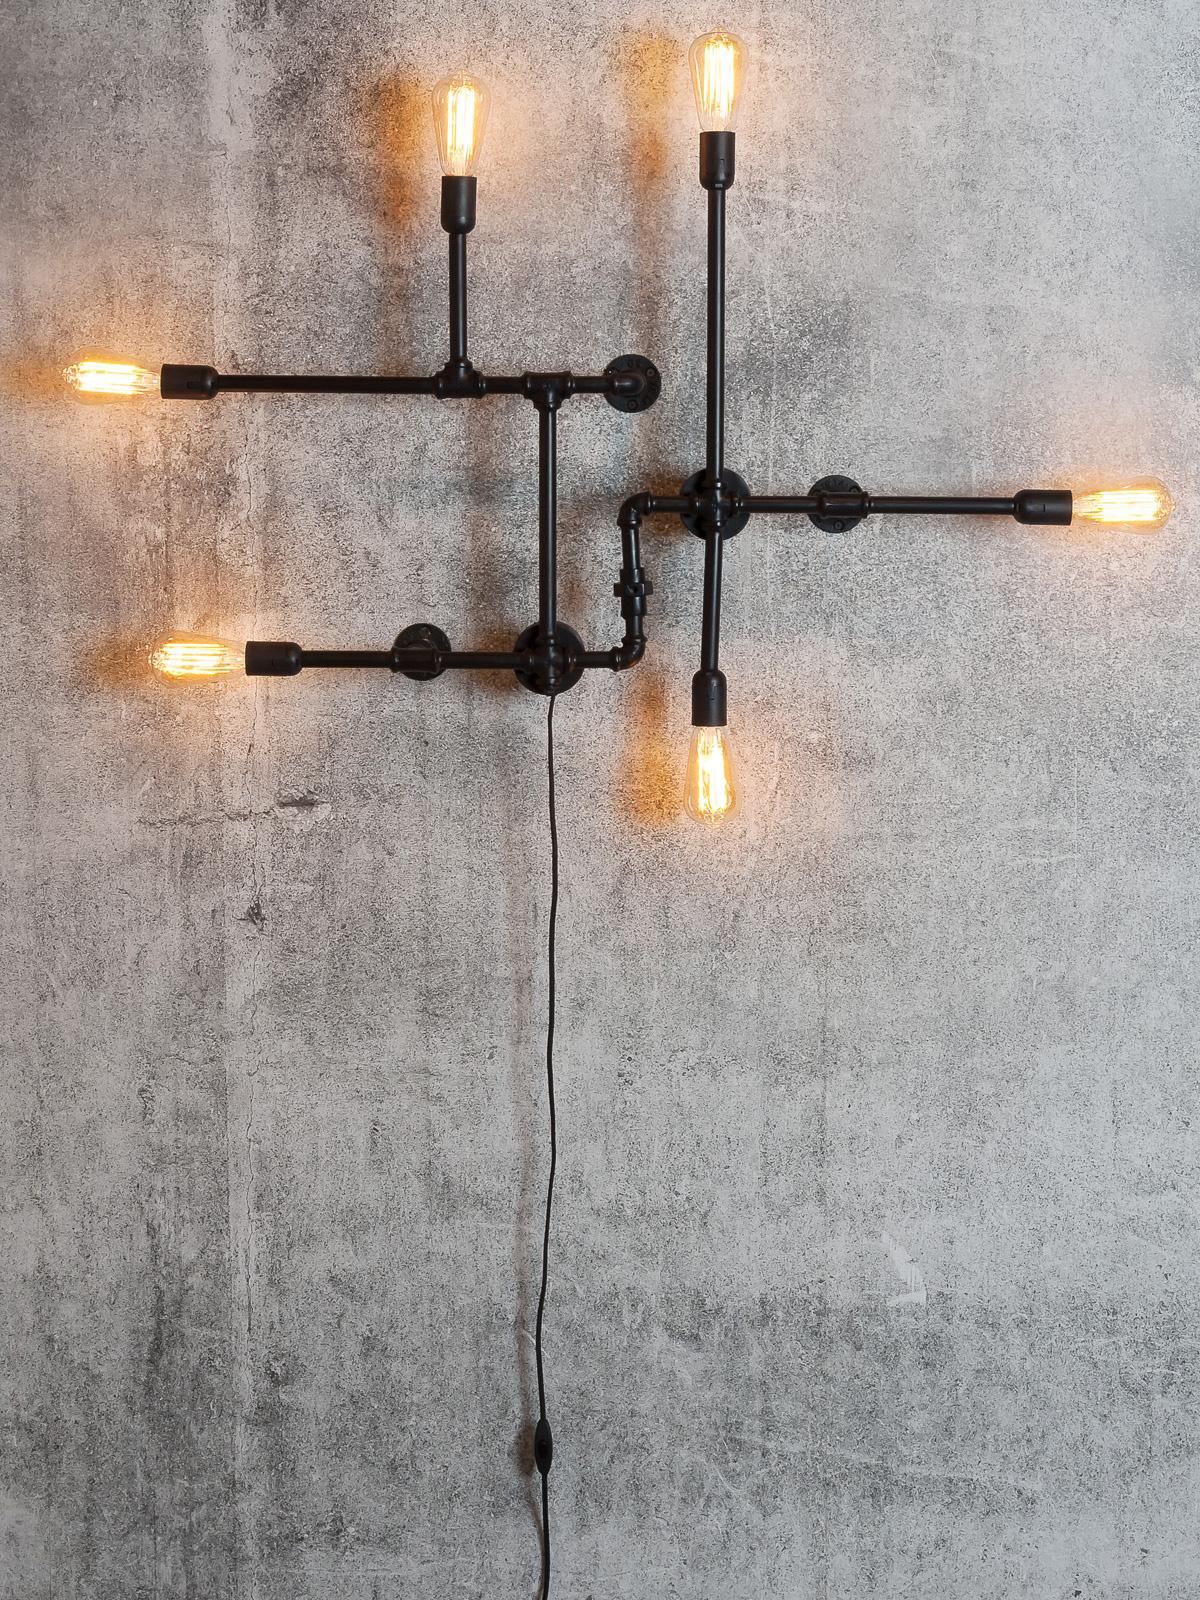 wasserrohr wandleuchte als blickfang eine lampe aus rohren casa lumi. Black Bedroom Furniture Sets. Home Design Ideas